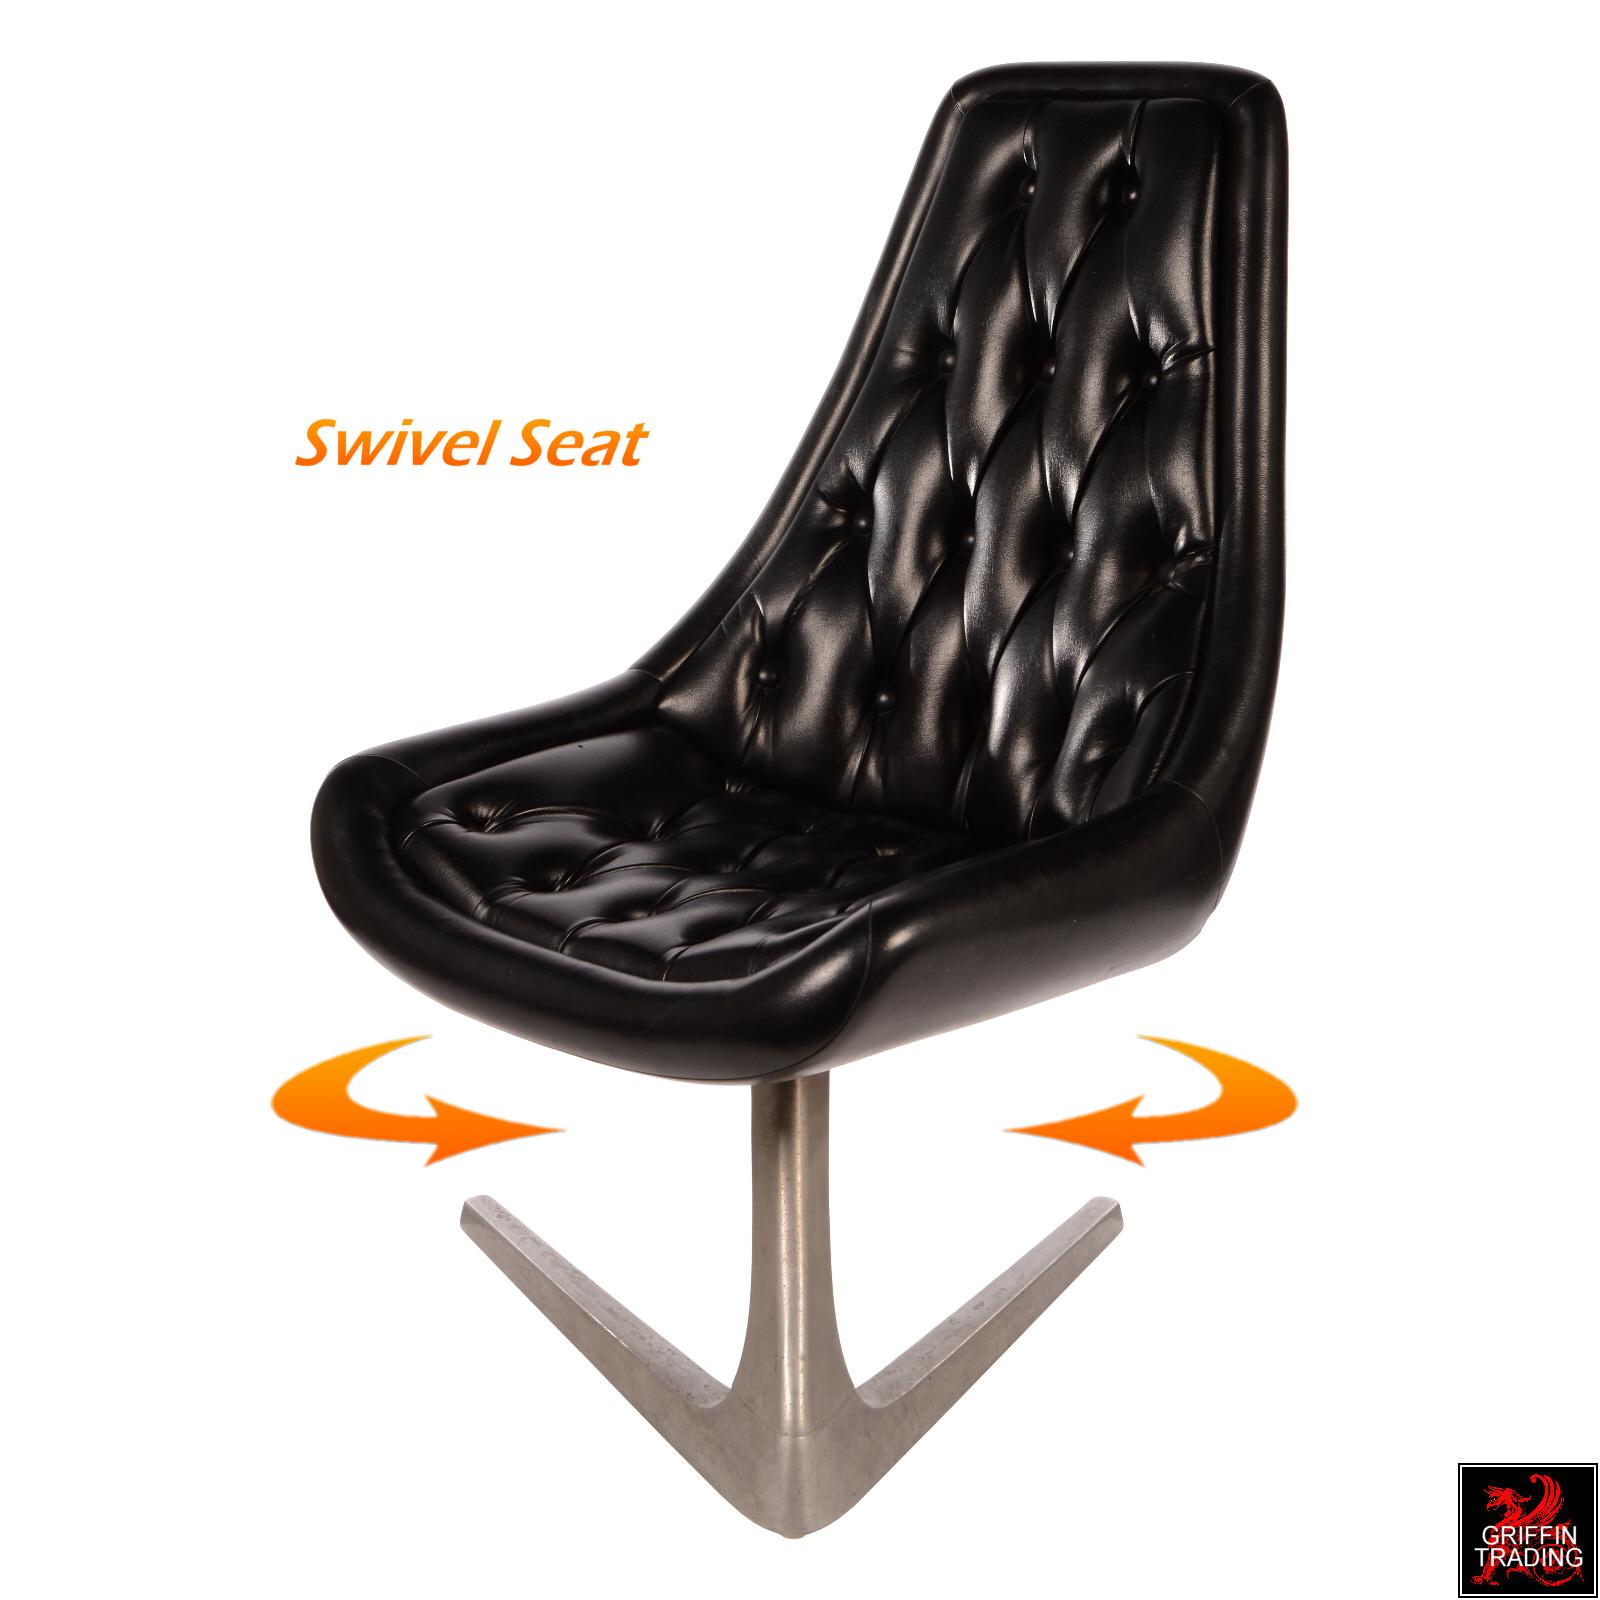 Surprising Chromcraft Sculpta Mid Century Dining Set Machost Co Dining Chair Design Ideas Machostcouk